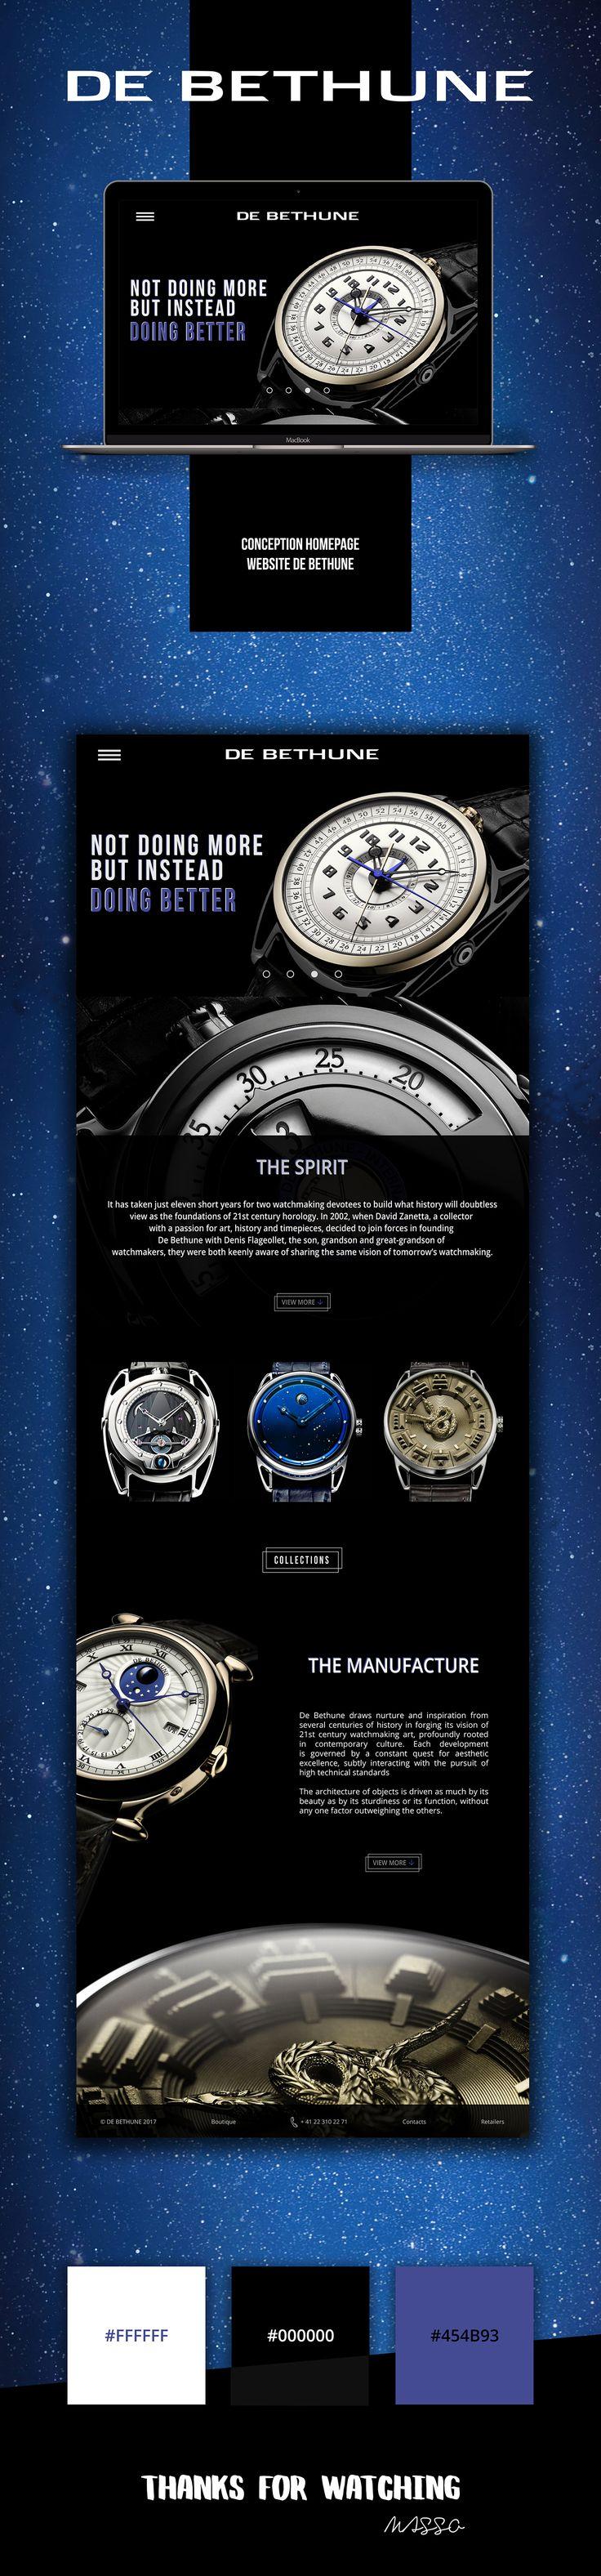 De Bethune Swiss Luxury Watches - Website Homepage on Behance